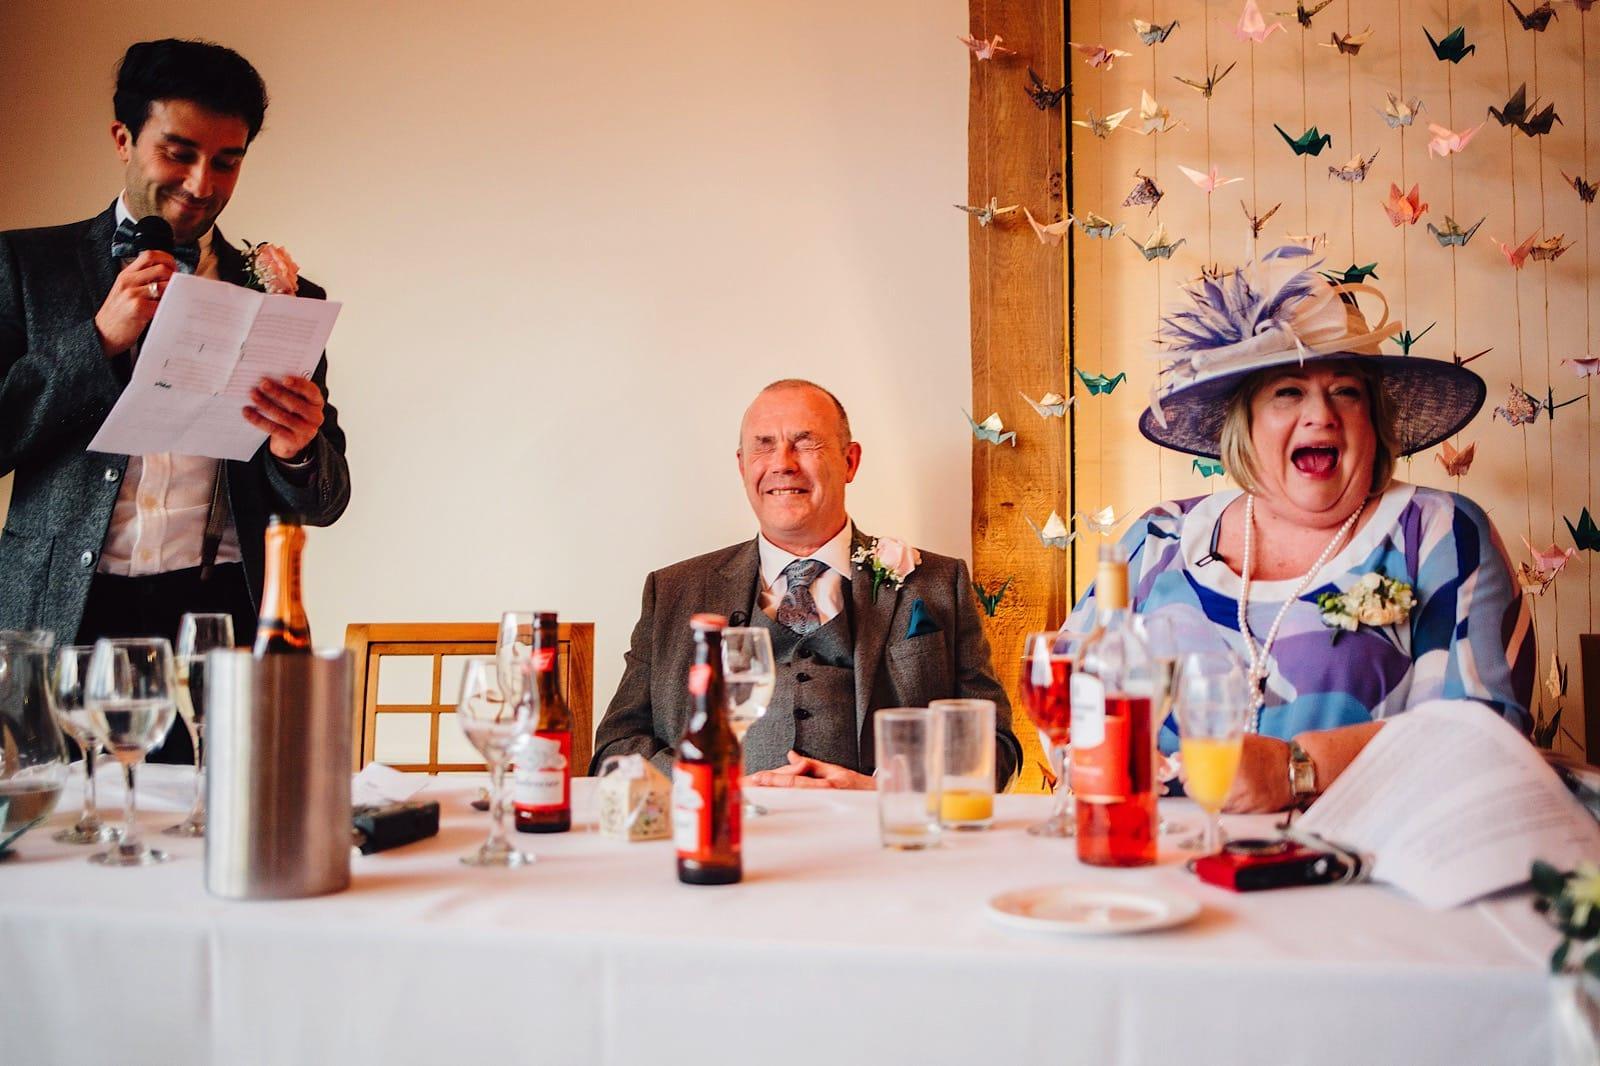 dodford manor northamptonshire wedding photography 0064